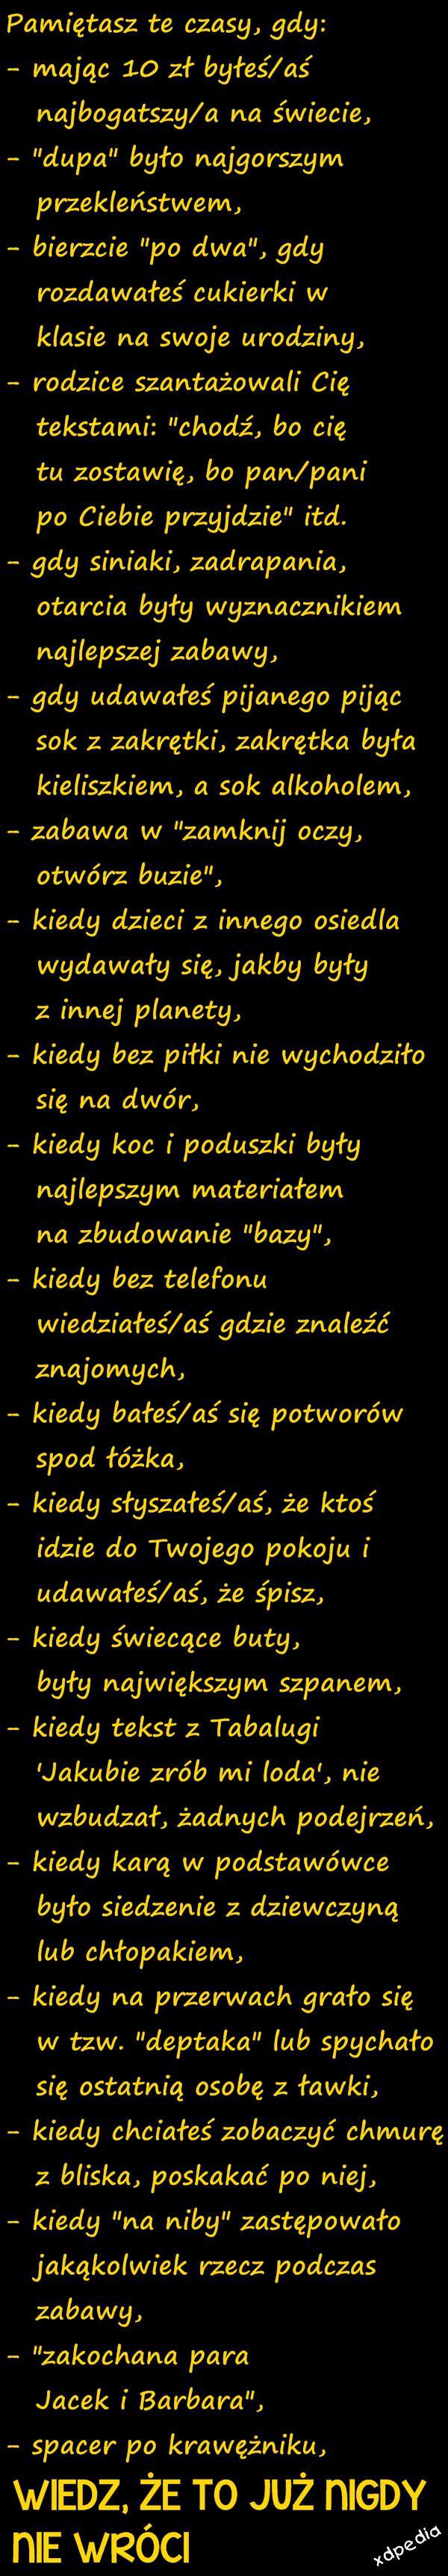 Rozstania Sentencje Mem Memy Cytaty Brak Xdpedia 68610